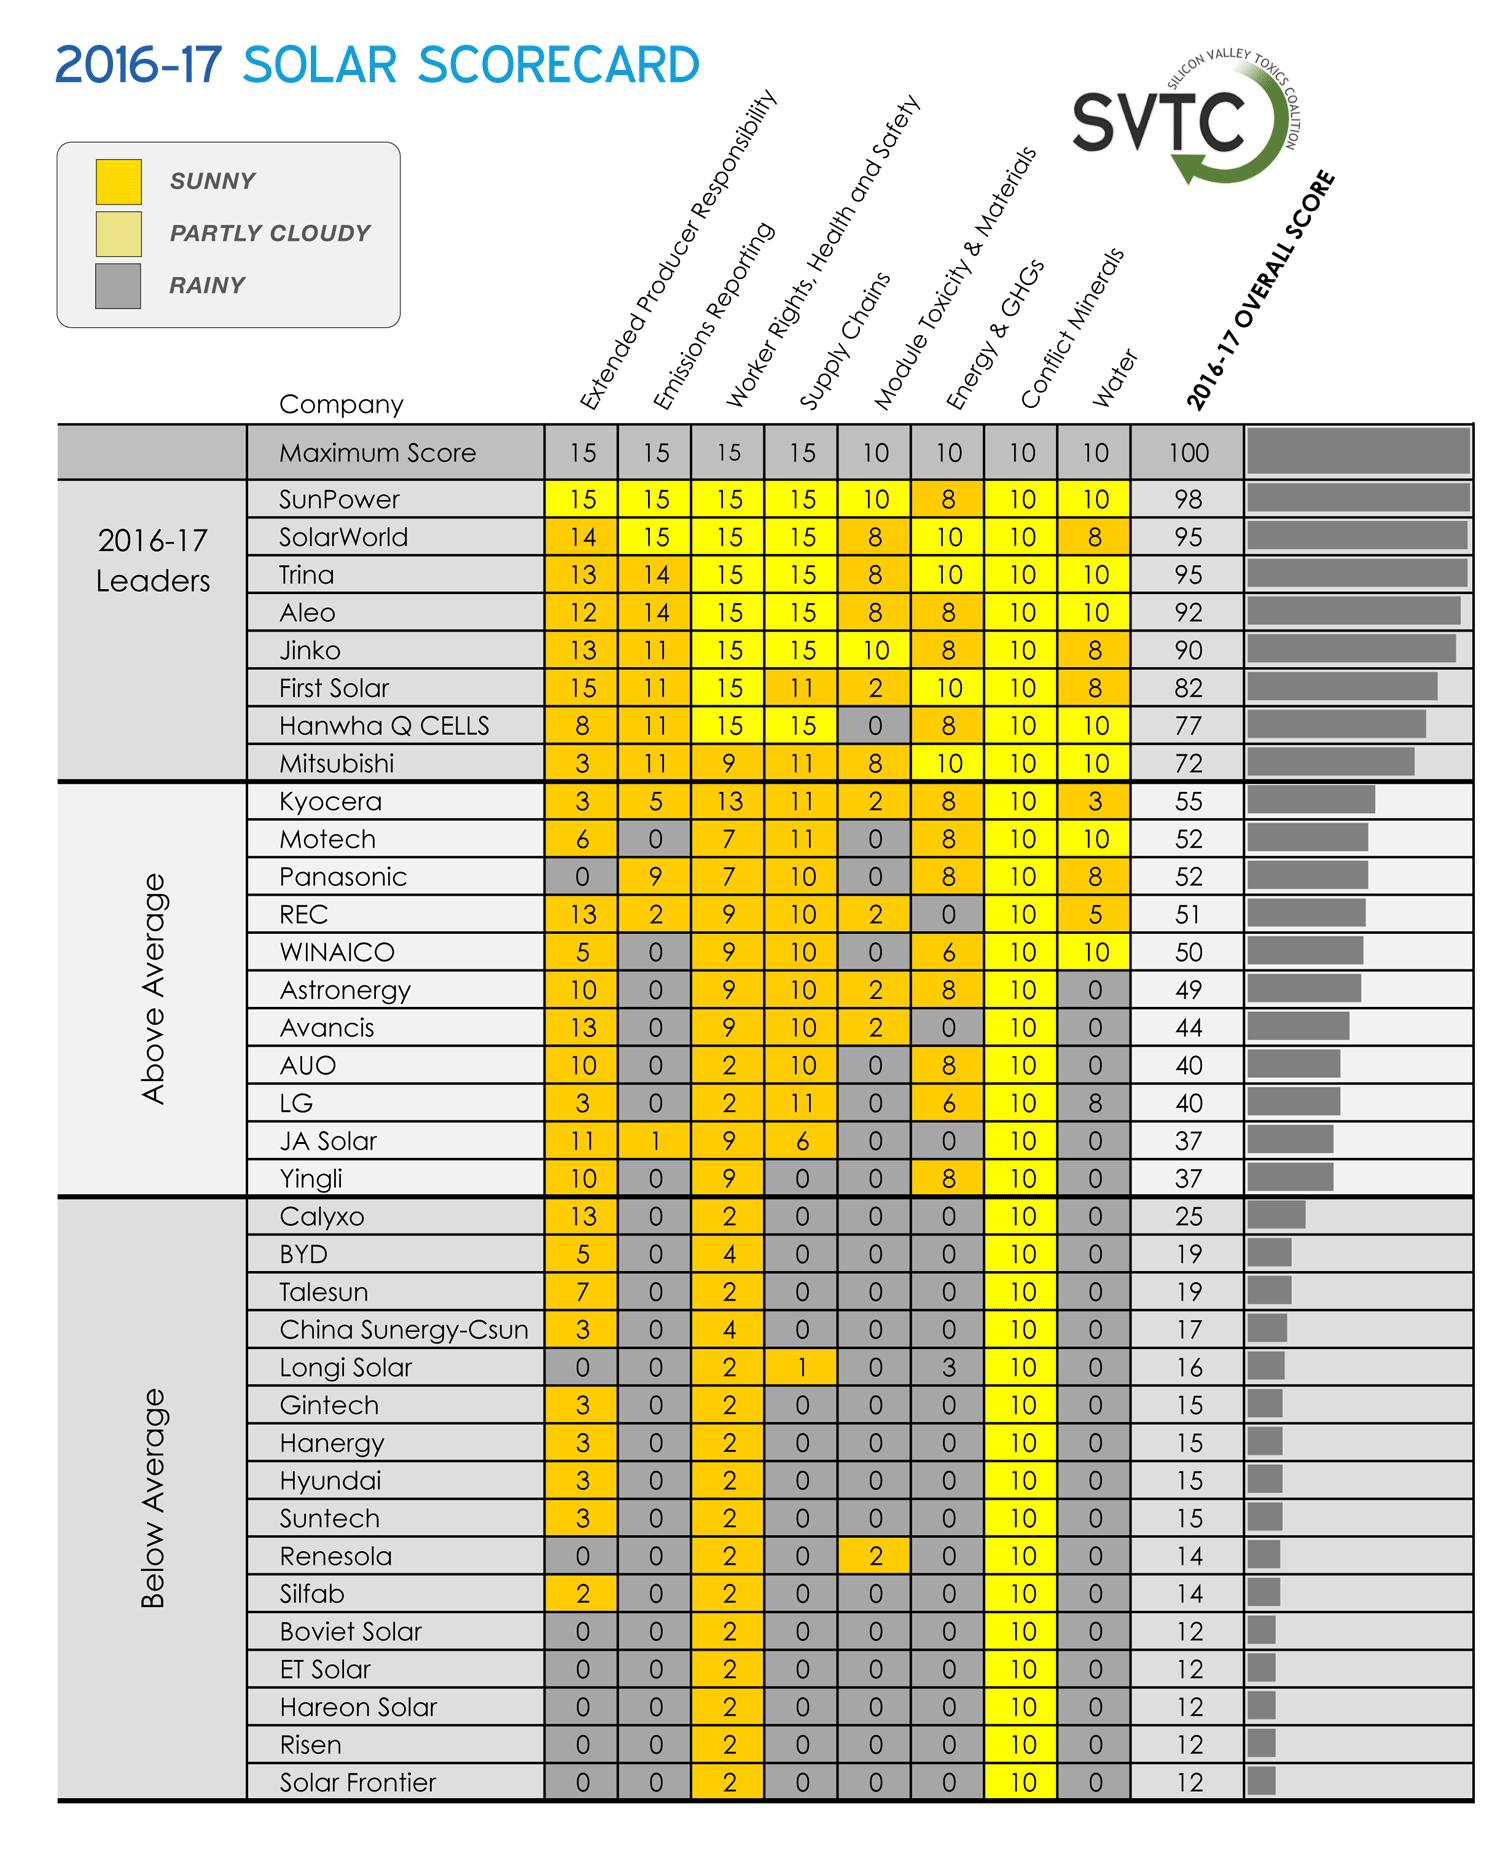 SVTC 2016/17 Solar Scorecard